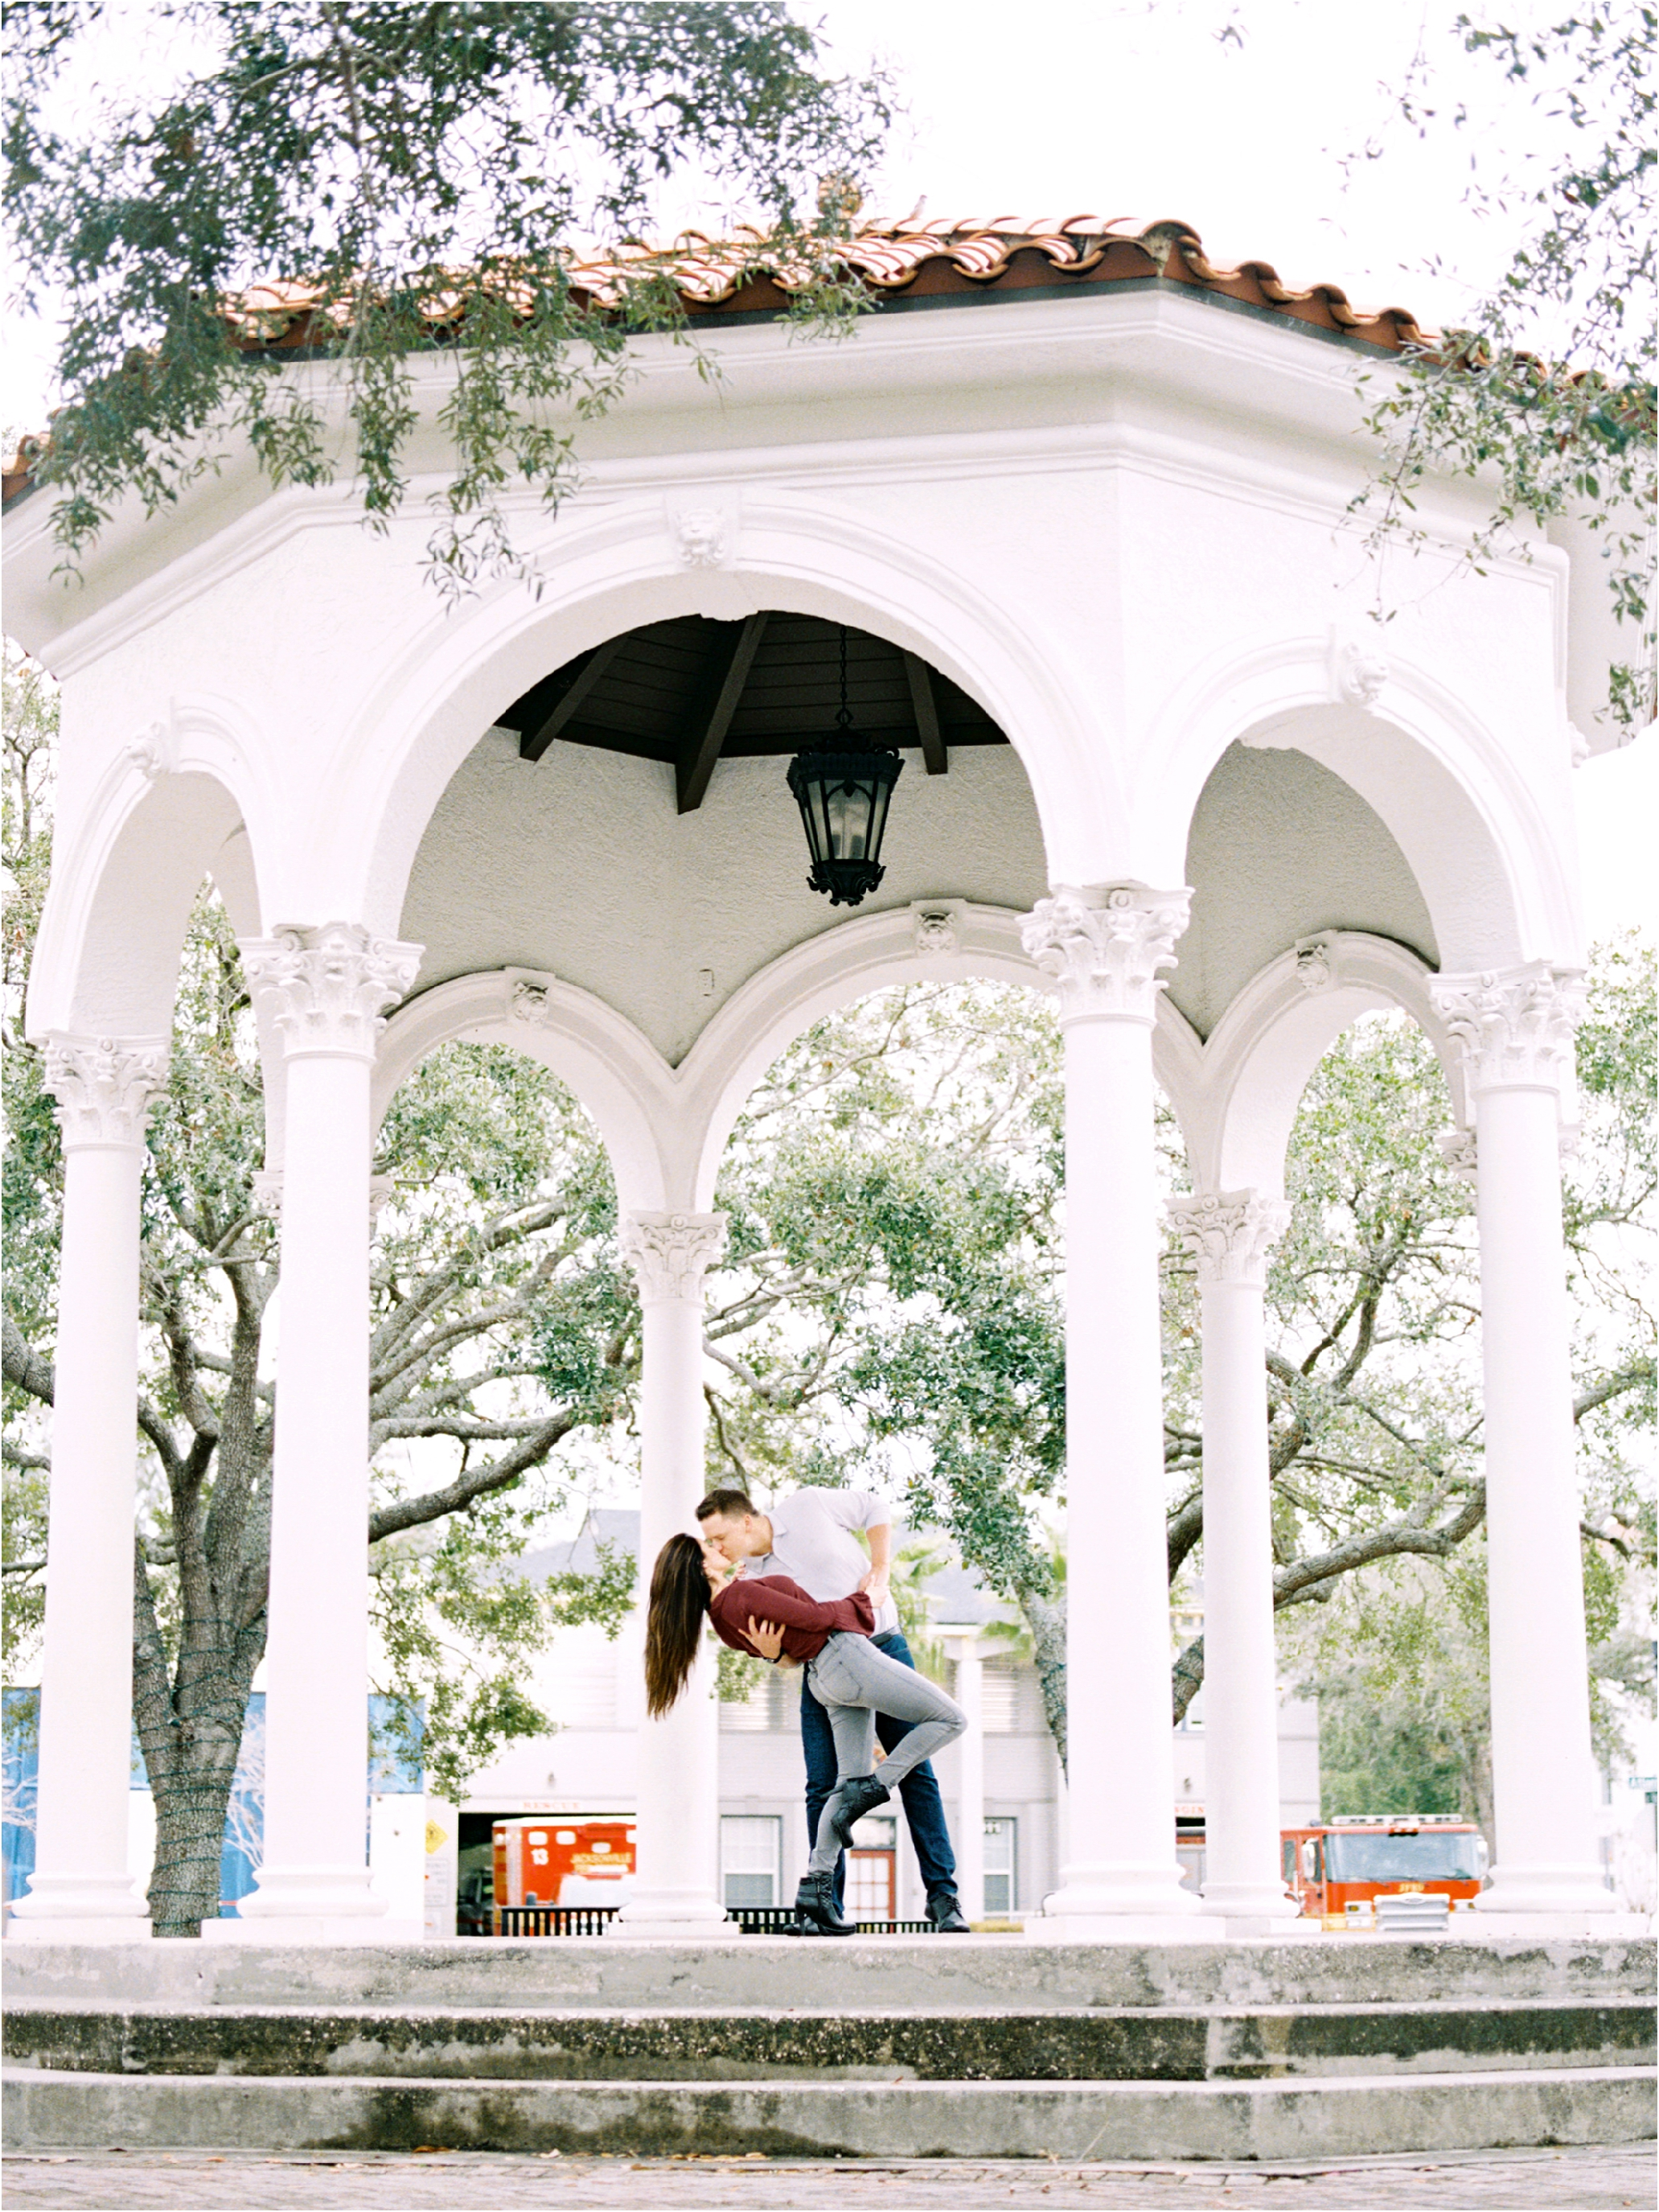 Lisa Silva Photography- Ponte Vedra Beach and Jacksonville, Florida Fine Art Film Wedding Photography- San Marco Jacksonville florida Engagement Session_0022.jpg